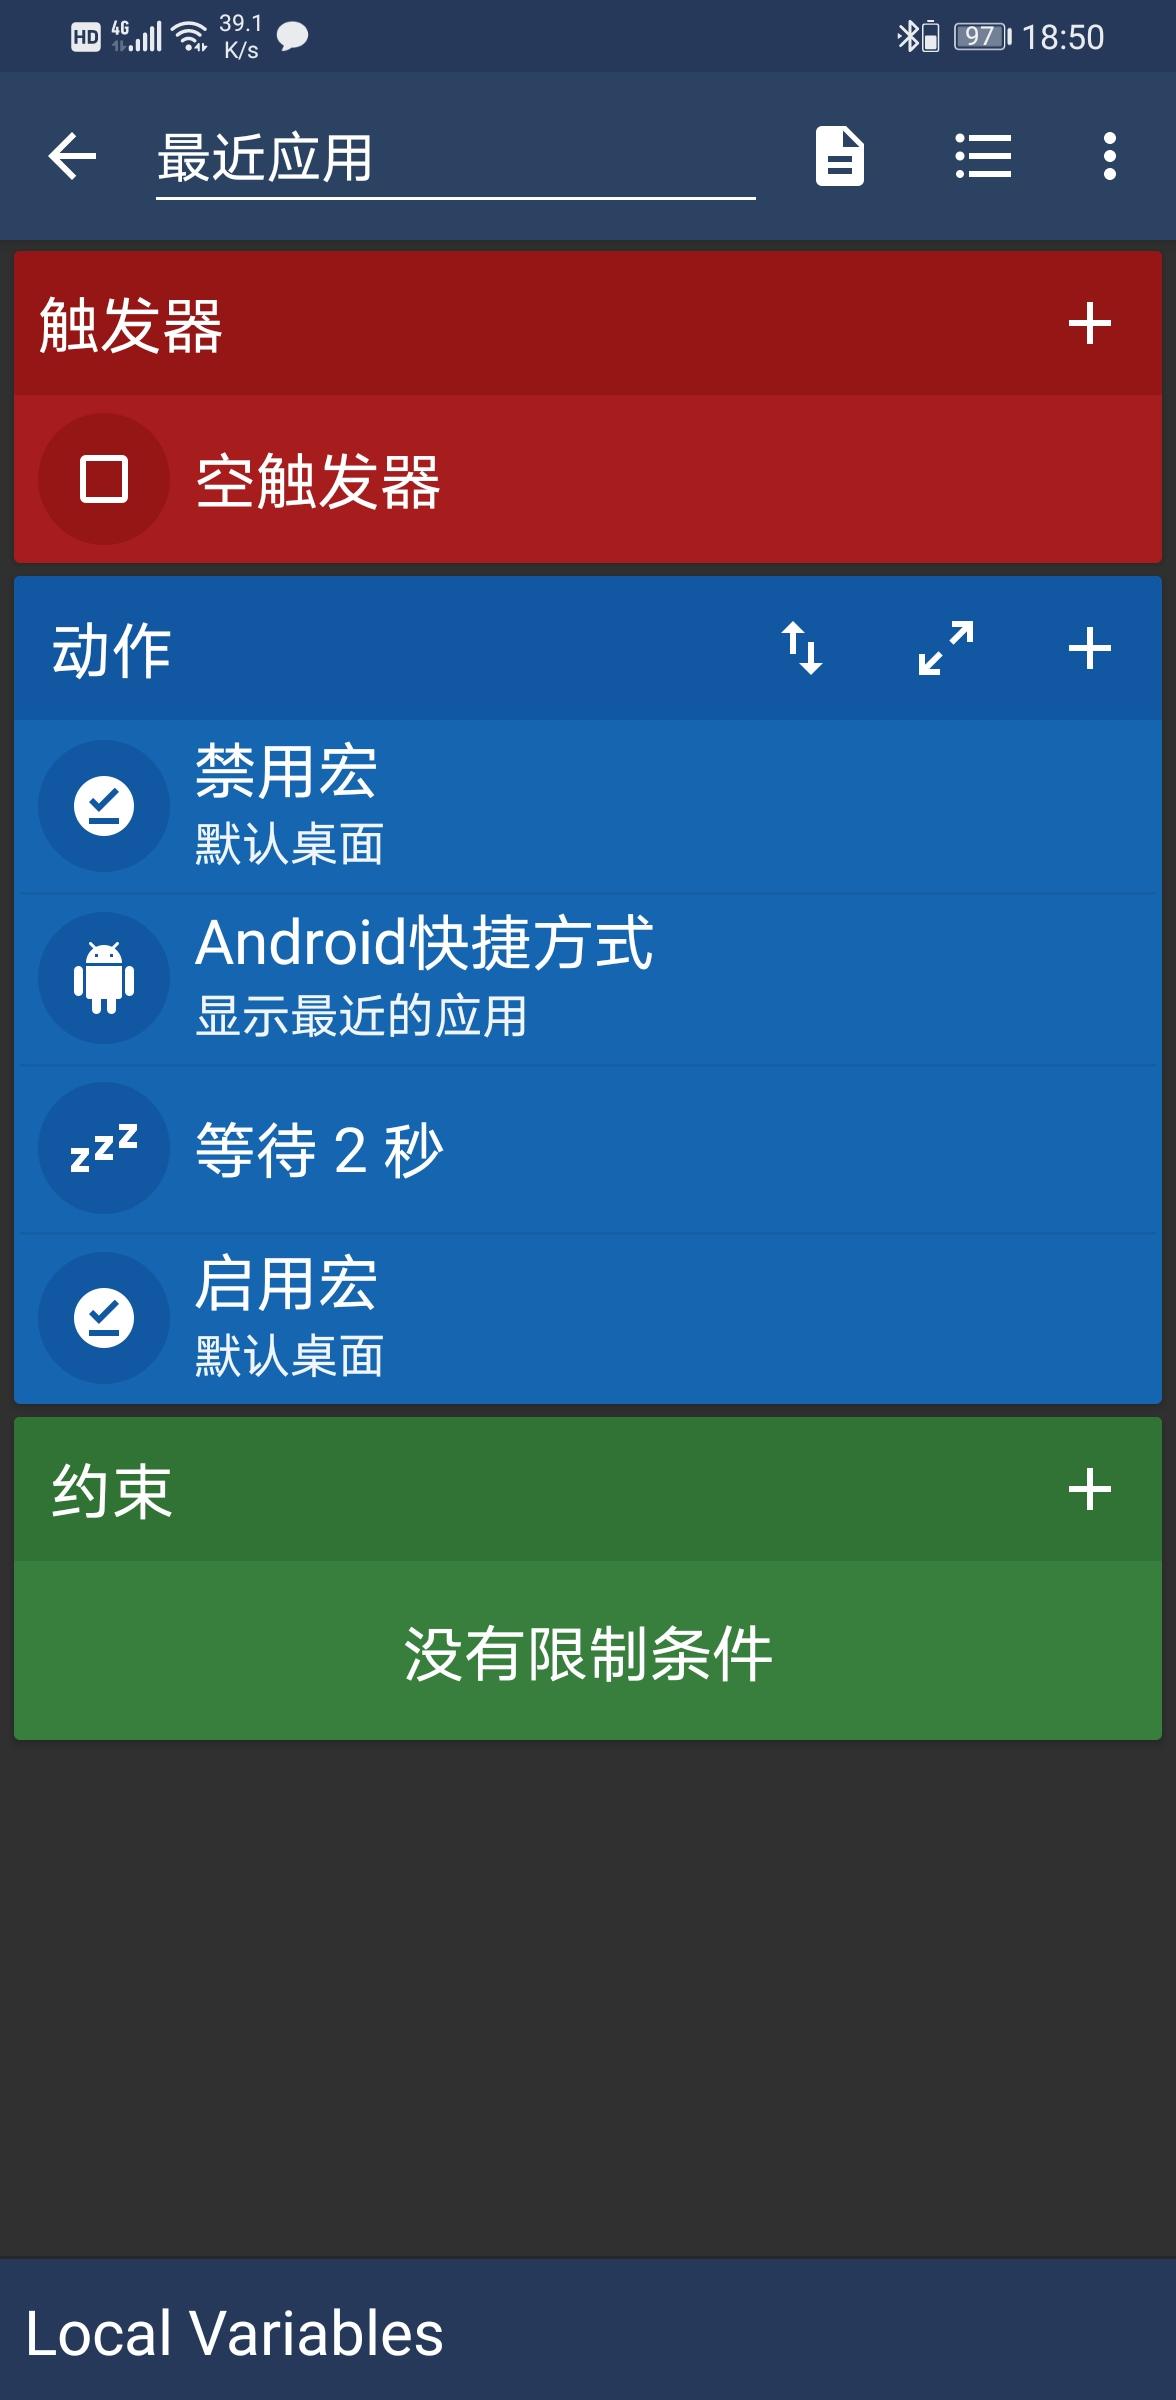 Screenshot_20191214_185006_com.arlosoft.macrodroid.jpg